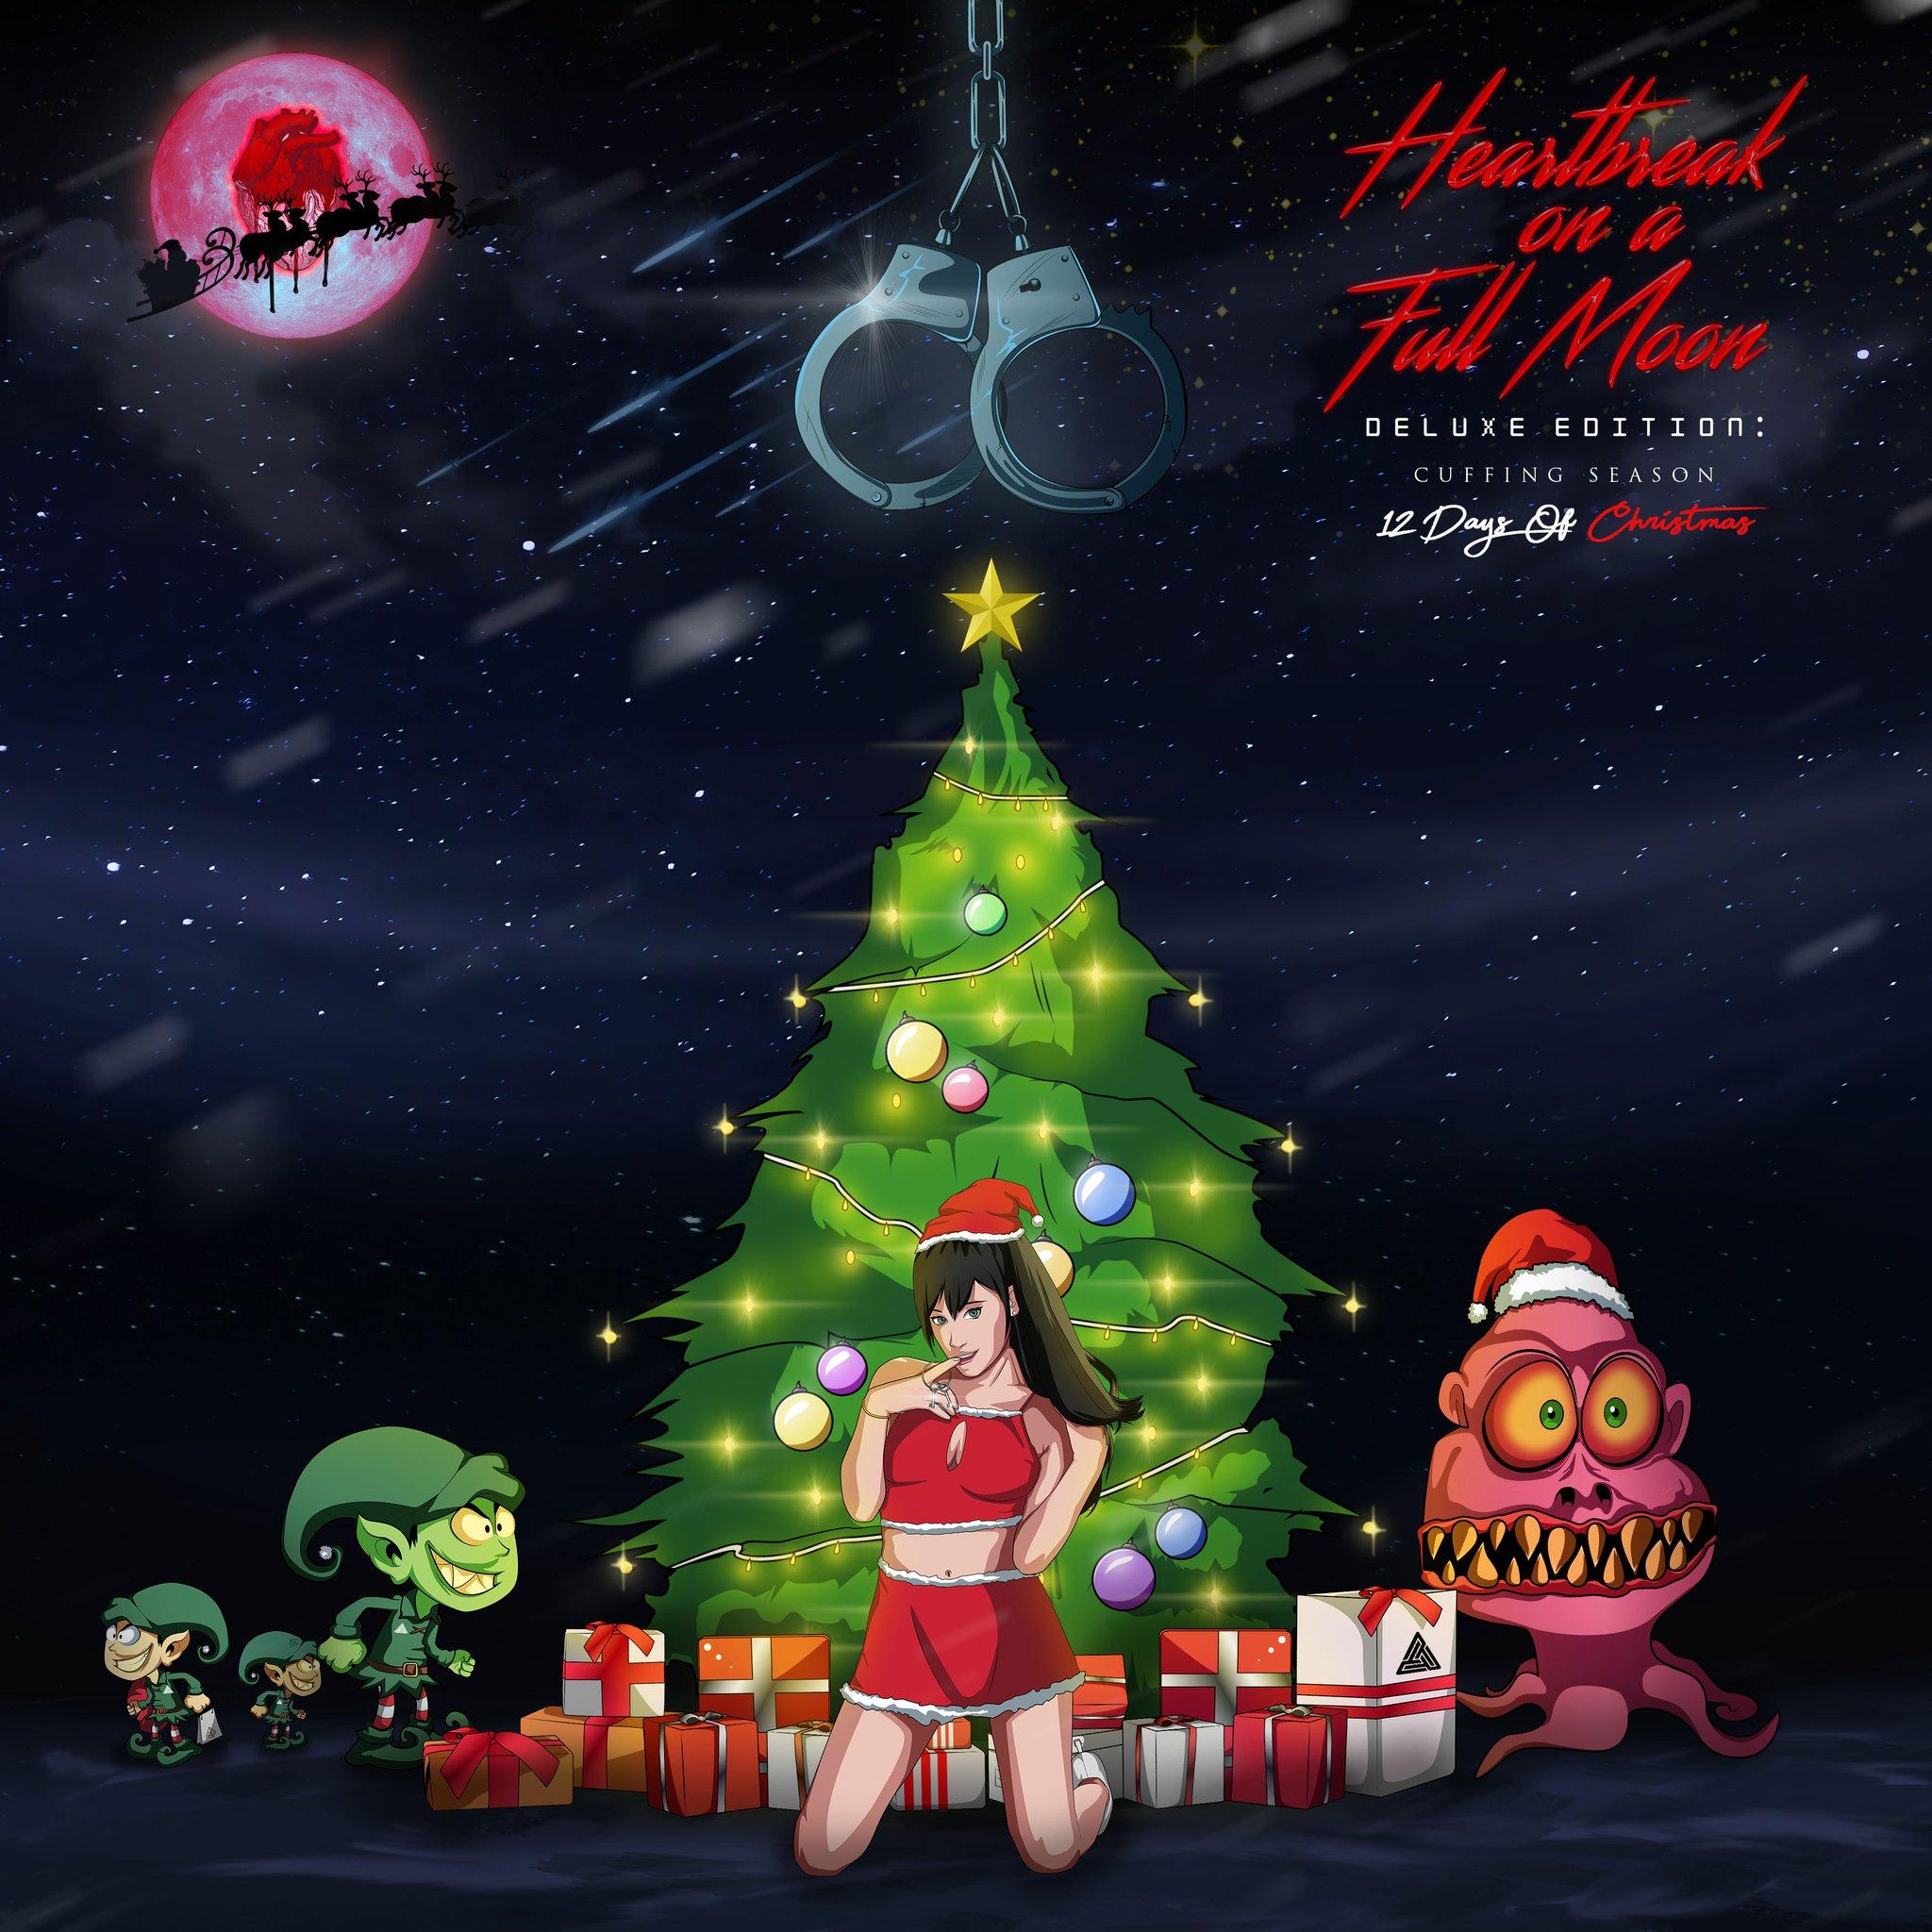 Stream 12 Days Of Christmas: CUFFING SEASON on @Spotify now! �� �� ❤️ https://t.co/O478P4fTEz https://t.co/2hAKvw6Rrt